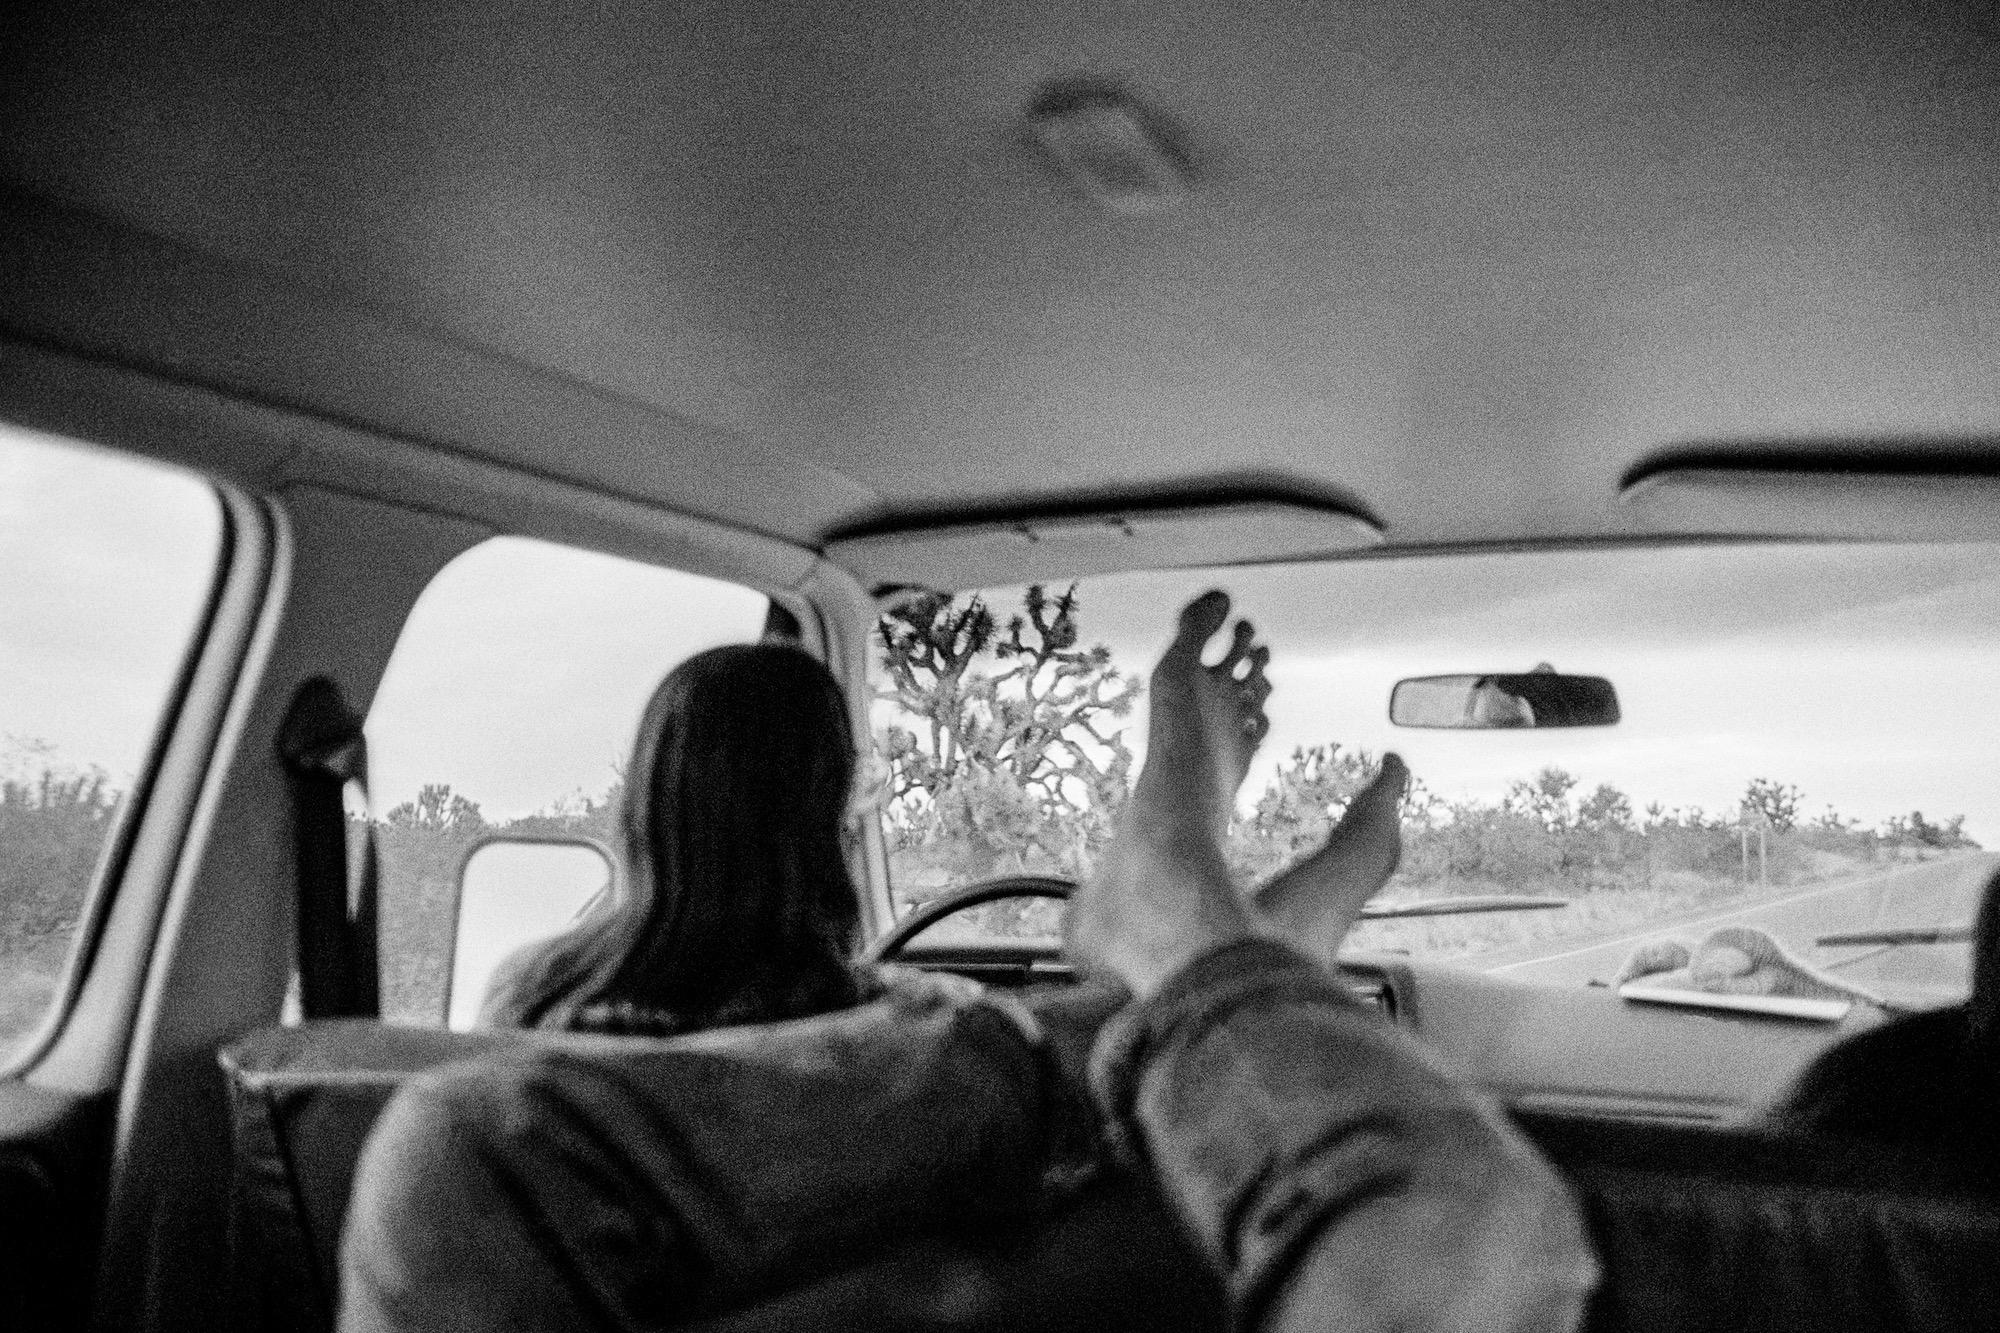 On the road from California to Arizona via Joshua Tree Forest. 1979.